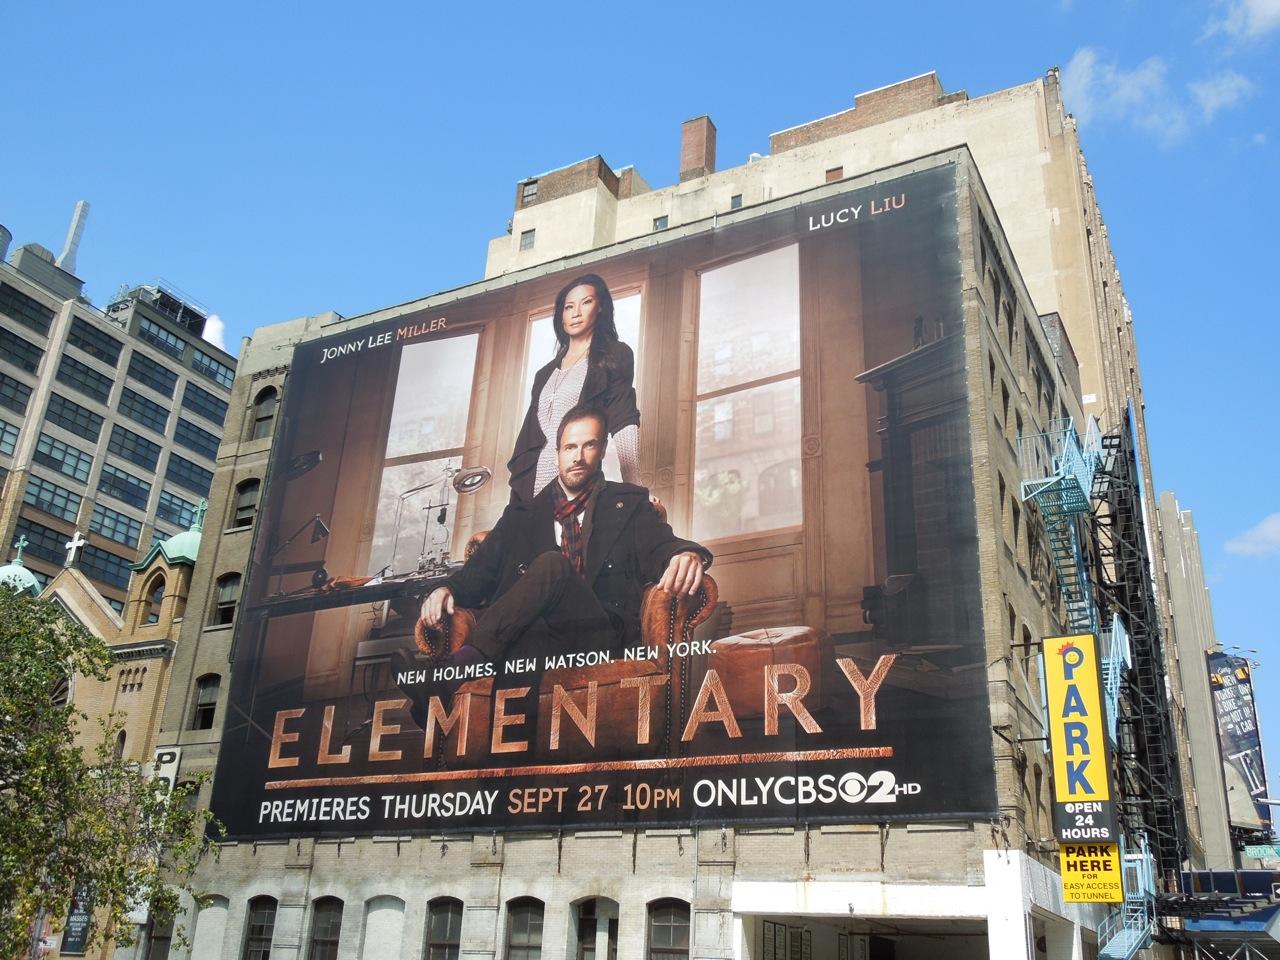 http://1.bp.blogspot.com/-2N60WIfQJQ0/UEEZsdZMIxI/AAAAAAAAyh0/yn_PRPBw9kk/s1600/Giant+Elementary+season1+billboard+NYC.jpg